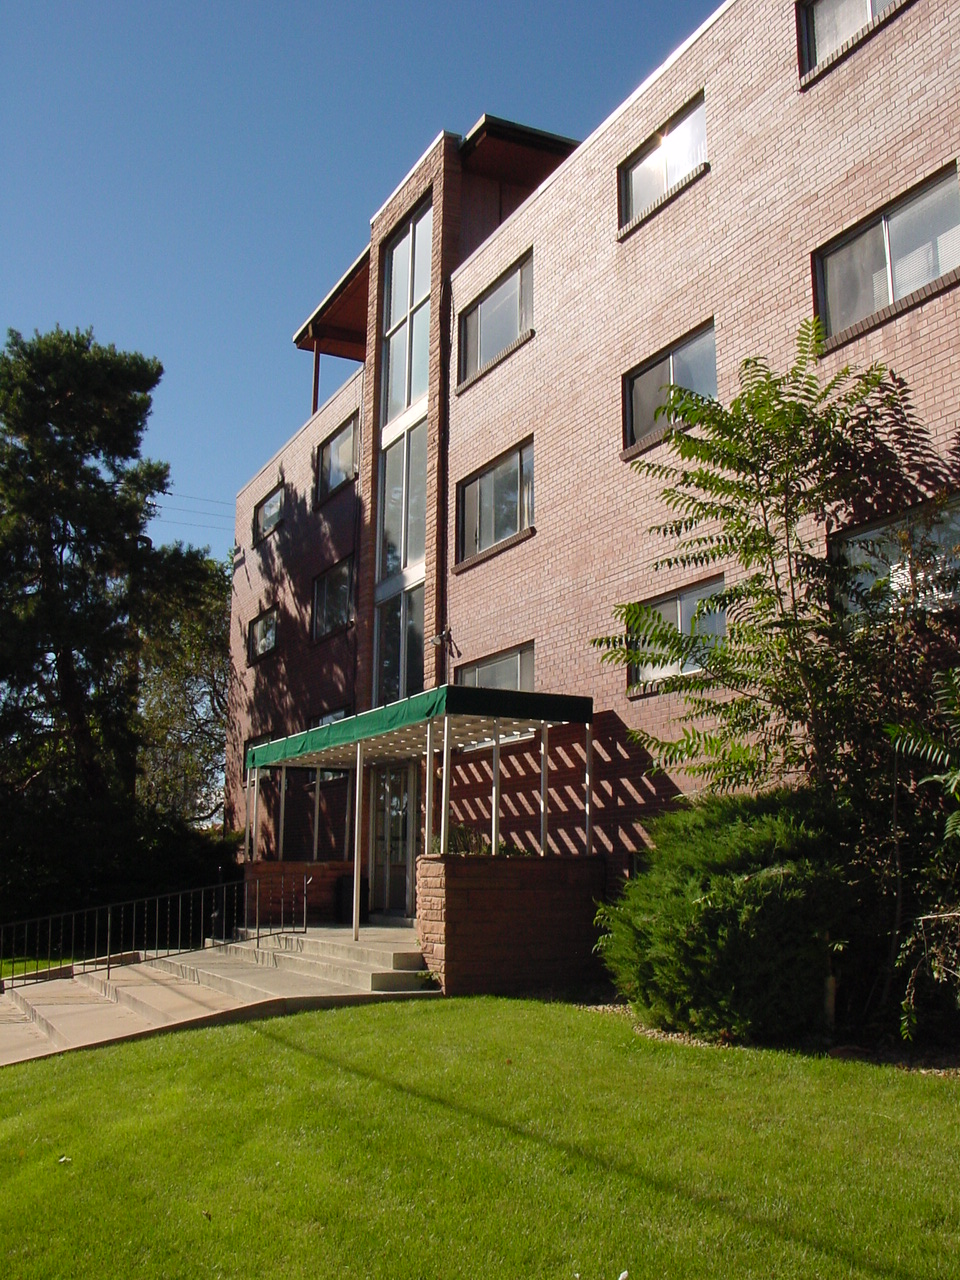 Apartment Building For Sale Denver | Denver Apartment ...